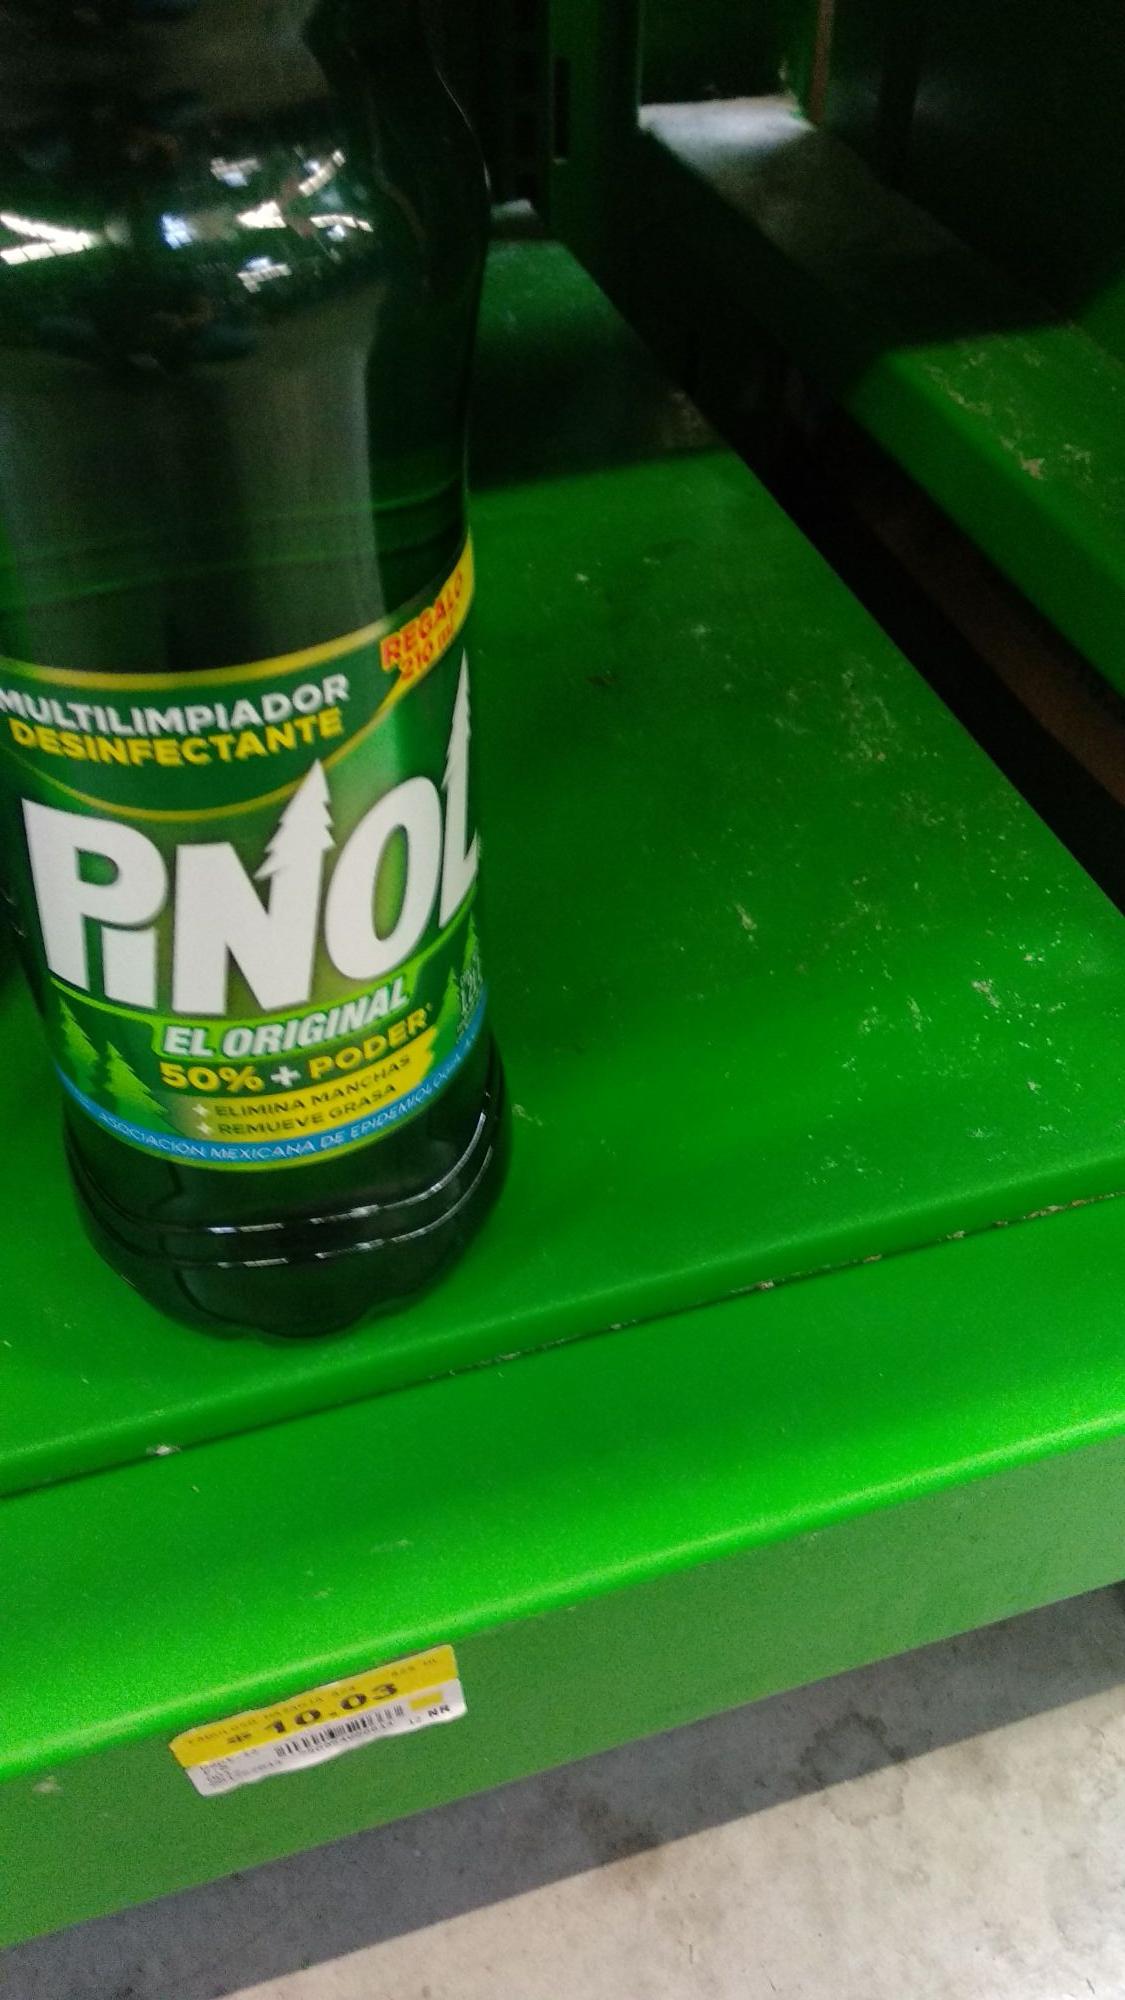 Bodega Aurrerá: Limpiador Pinol 1.2lts a $10.03 y mas